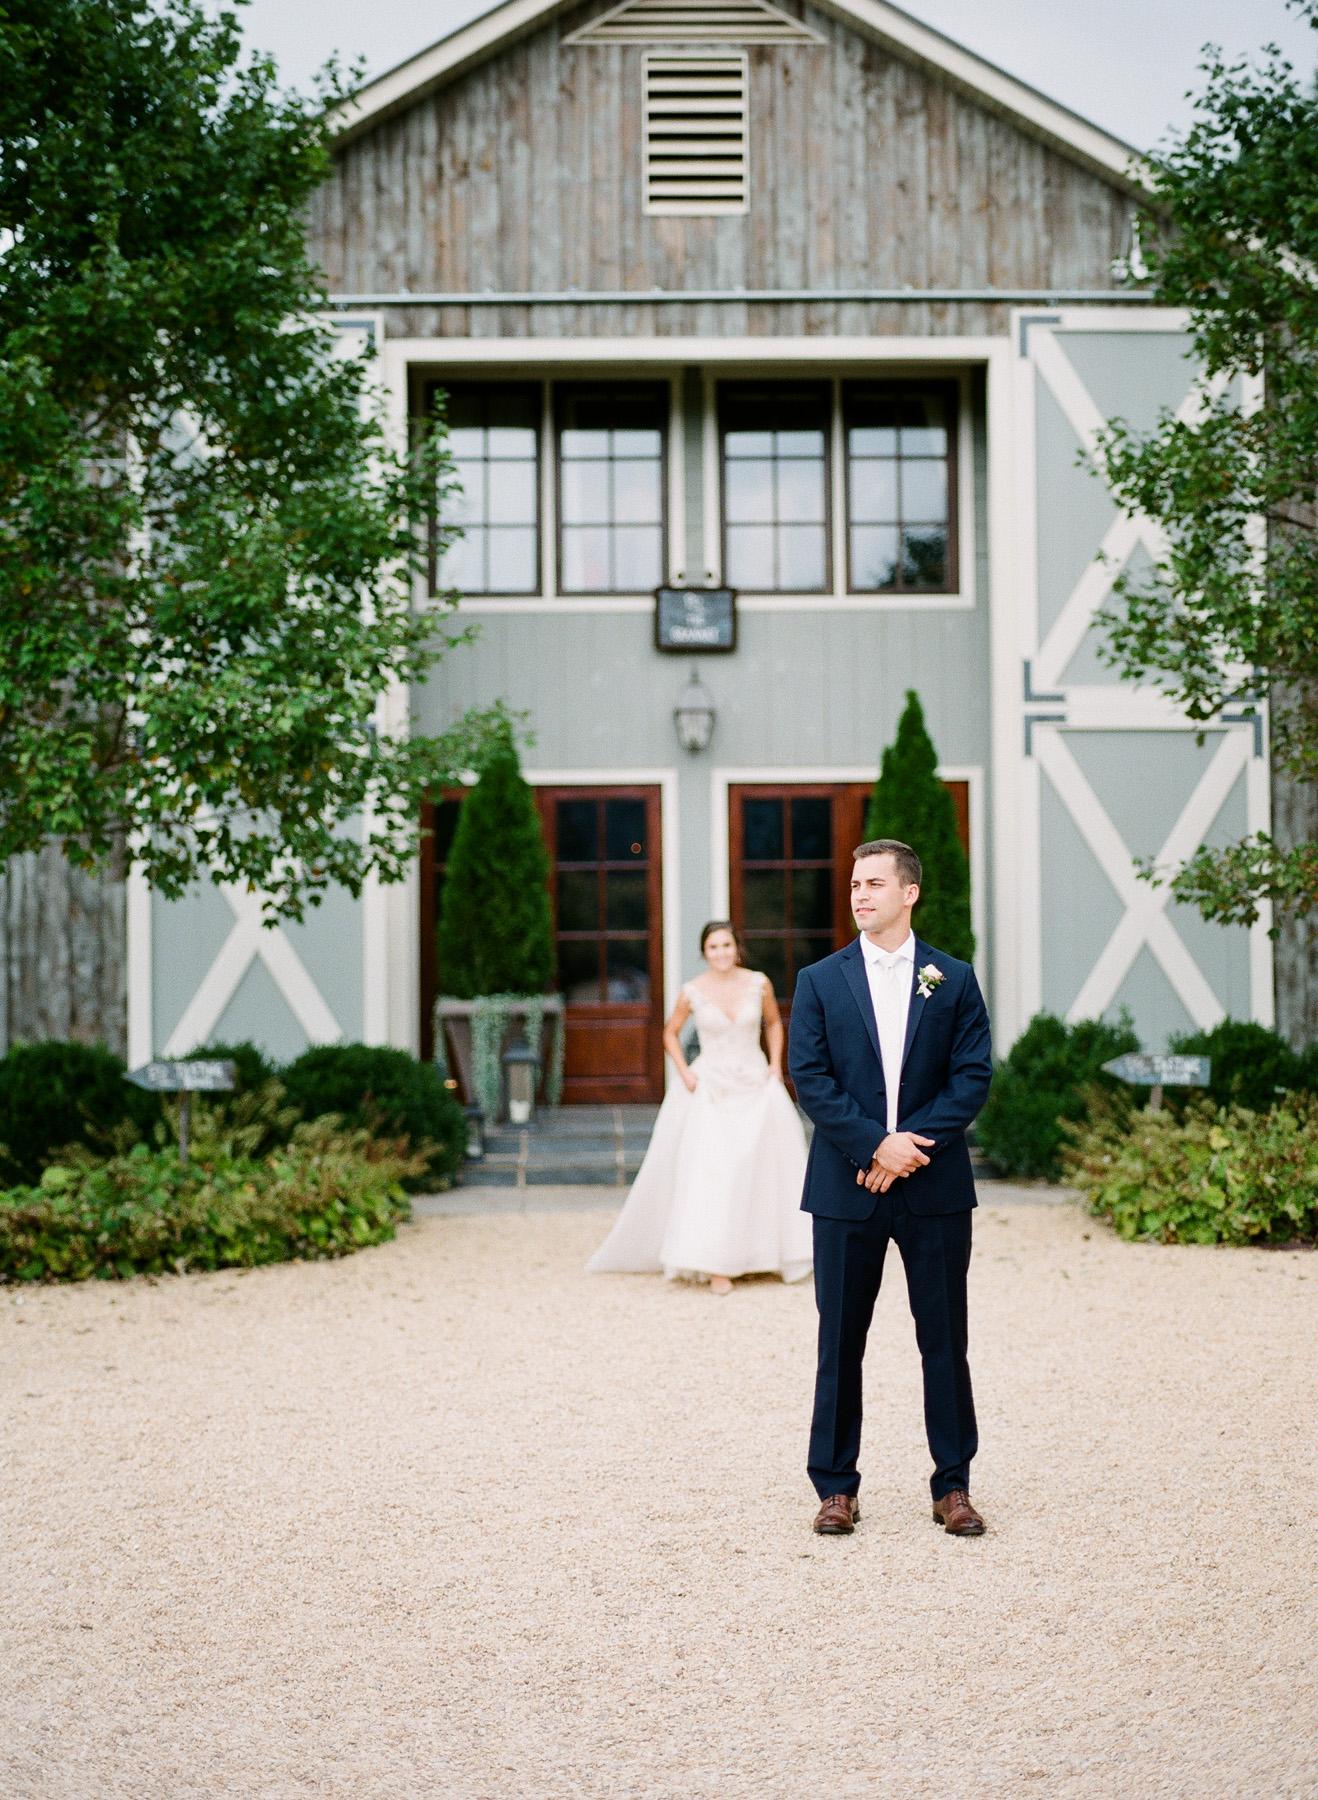 Pippin-Hill-Farm-and-Vinyards-Wedding-Film-Photography-15.jpg